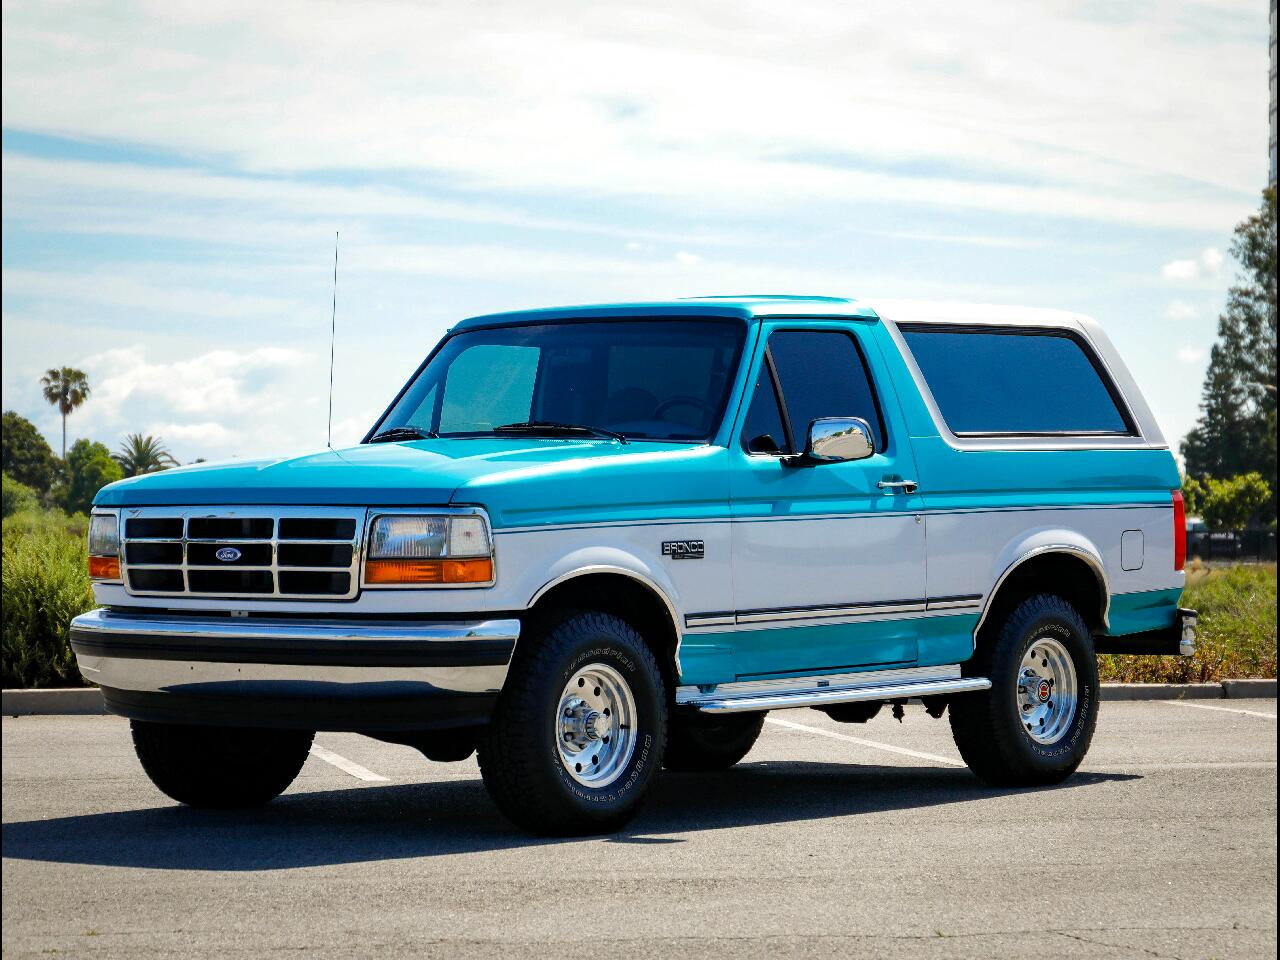 1994 Ford Bronco XLT 4X4